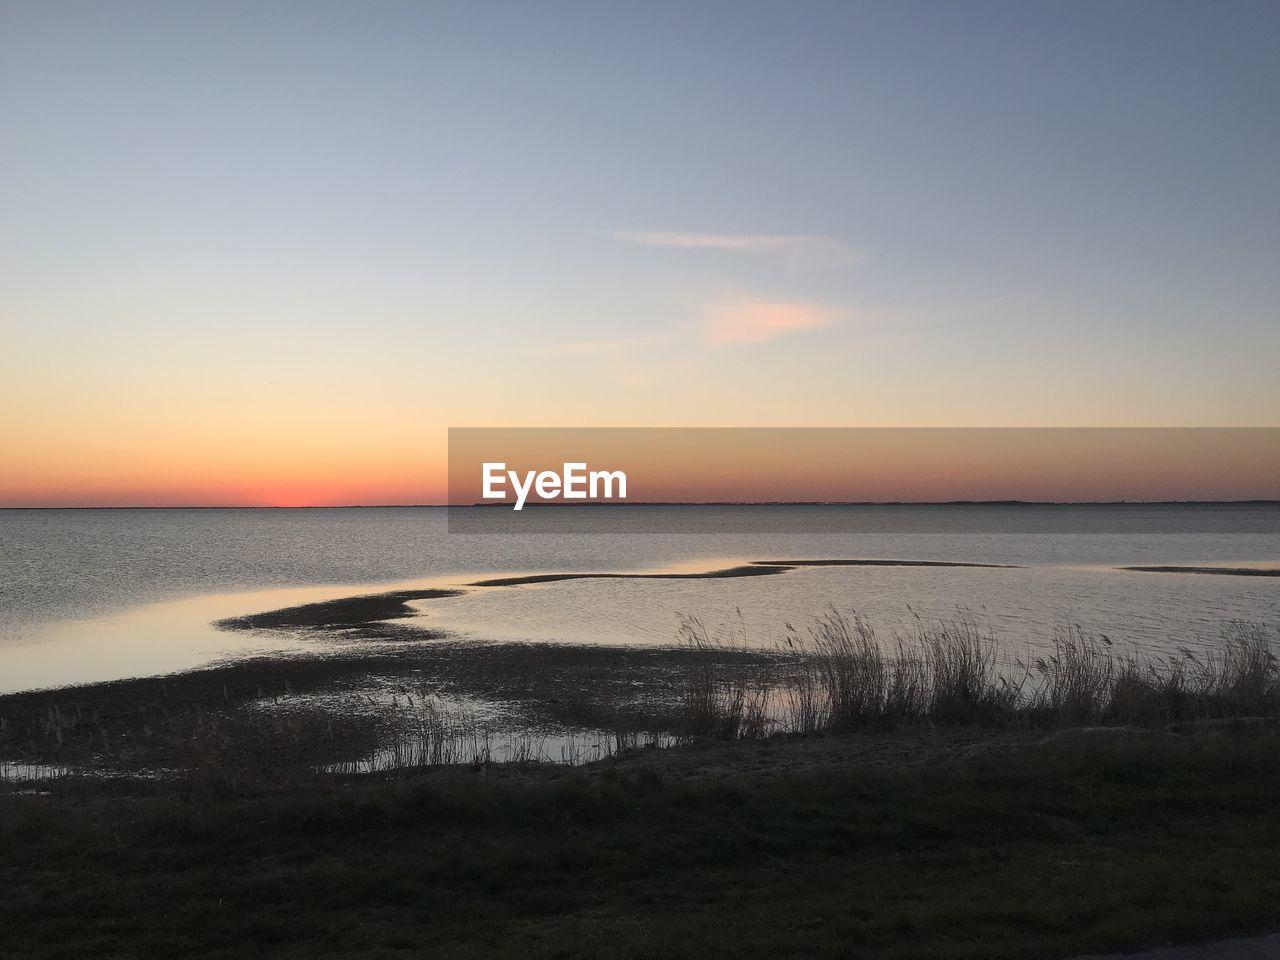 sky, water, scenics - nature, sunset, beauty in nature, tranquil scene, tranquility, sea, land, beach, horizon, horizon over water, idyllic, no people, nature, non-urban scene, orange color, grass, outdoors, marram grass